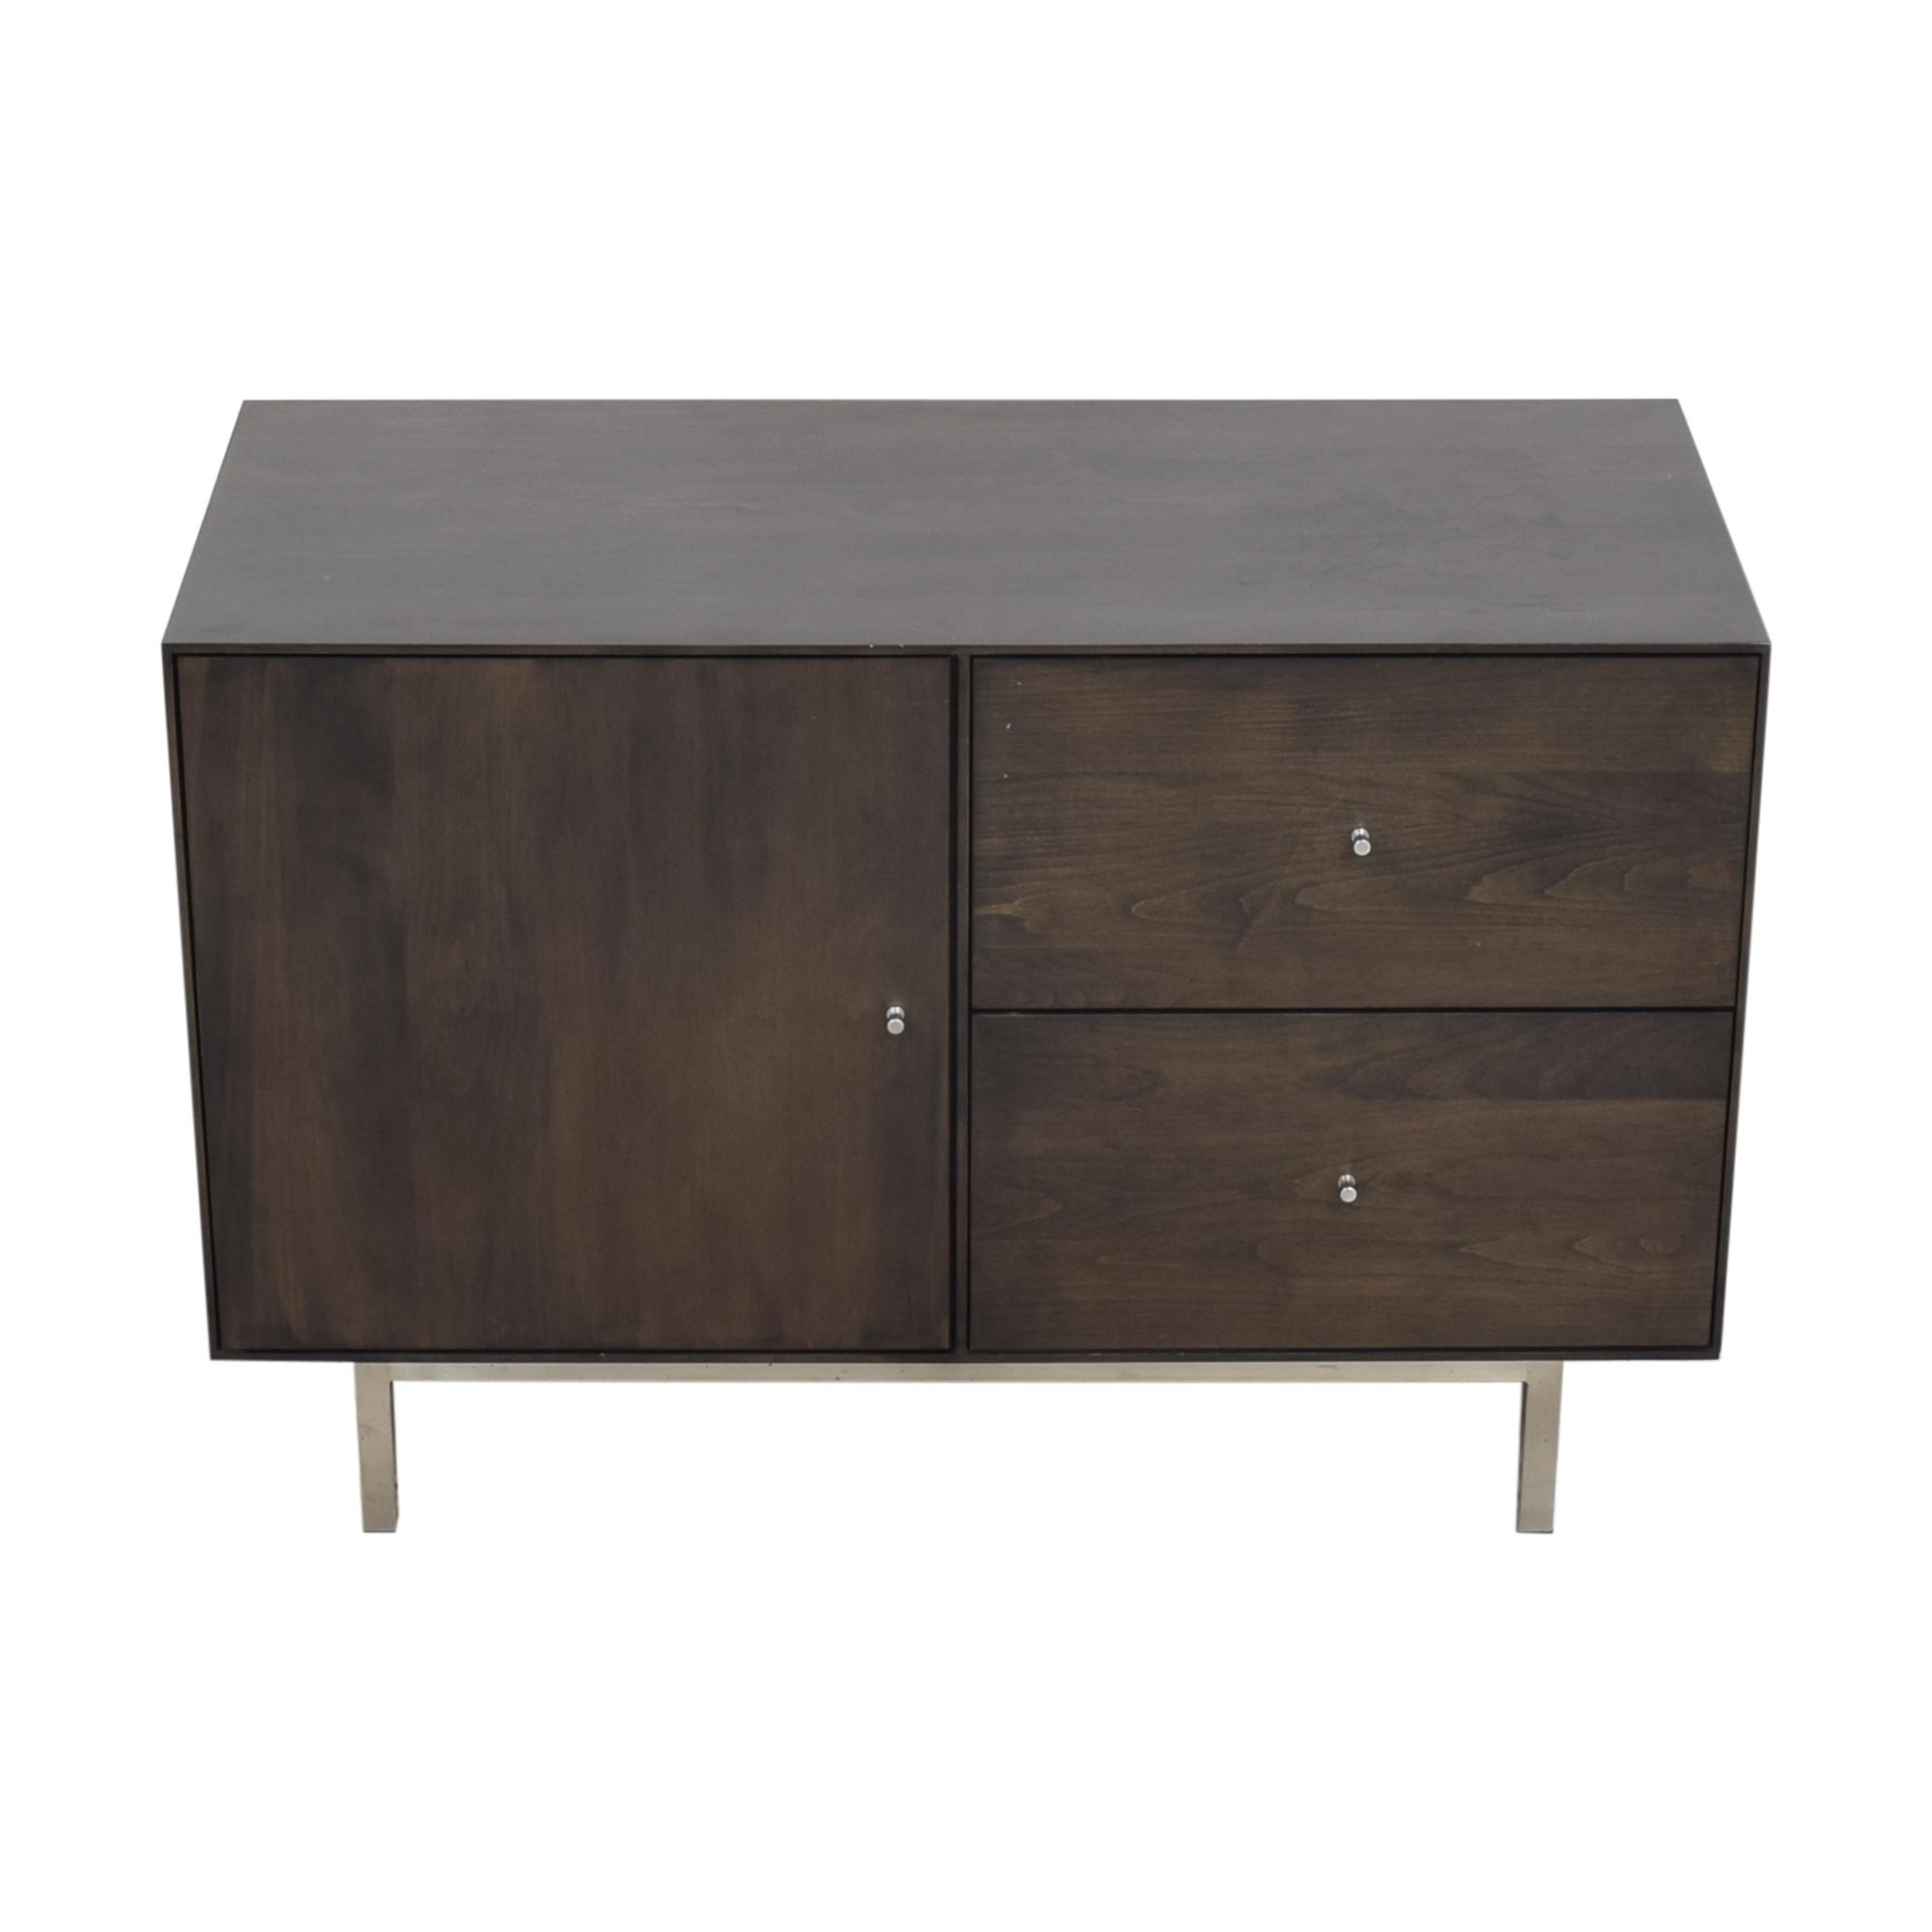 Room & Board Room & Board Hudson Custom Storage Cabinet used